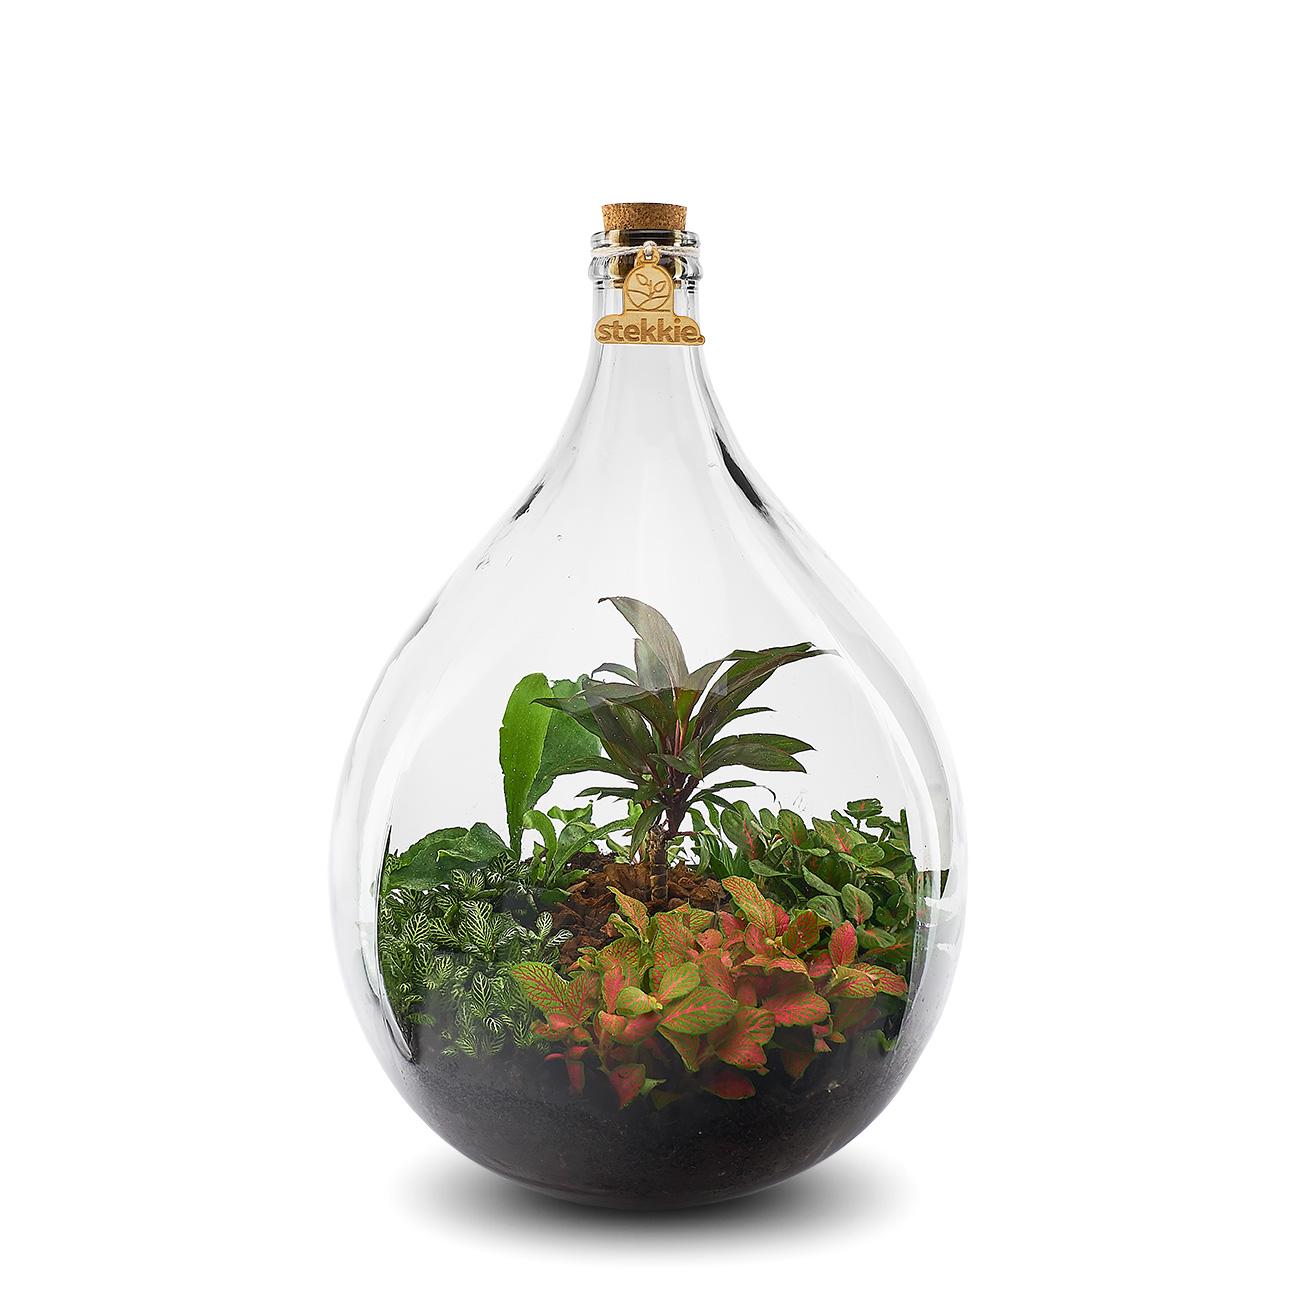 Stekkie Large mini-ecosysteem met rode accentkleur en mini palm